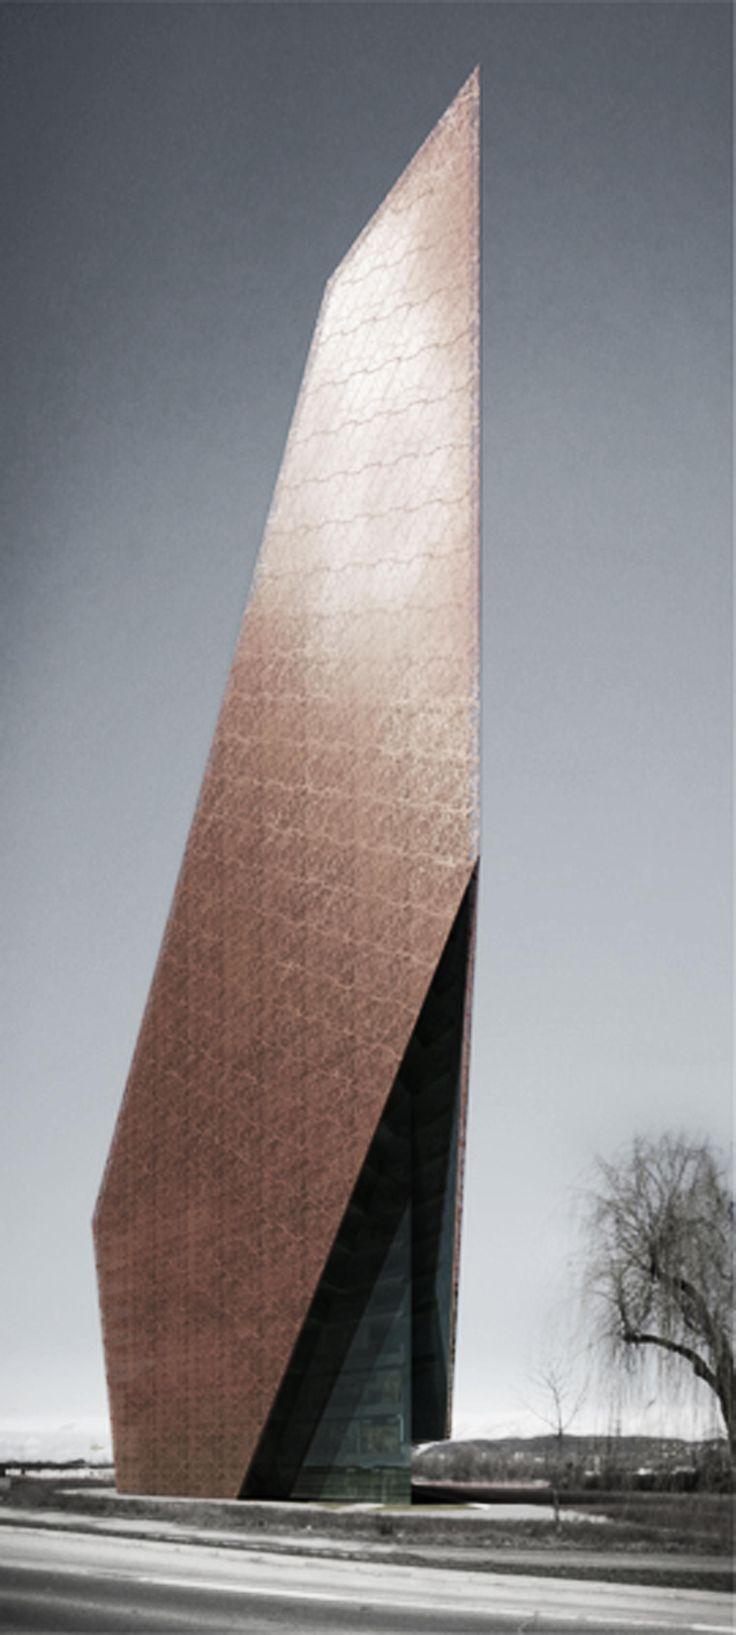 H/2_CRODUX TOWER,Croatia,by UPI2M 20+10+X World Architecture Community Awards 5. Cycle Winner #futuristicarchitecture